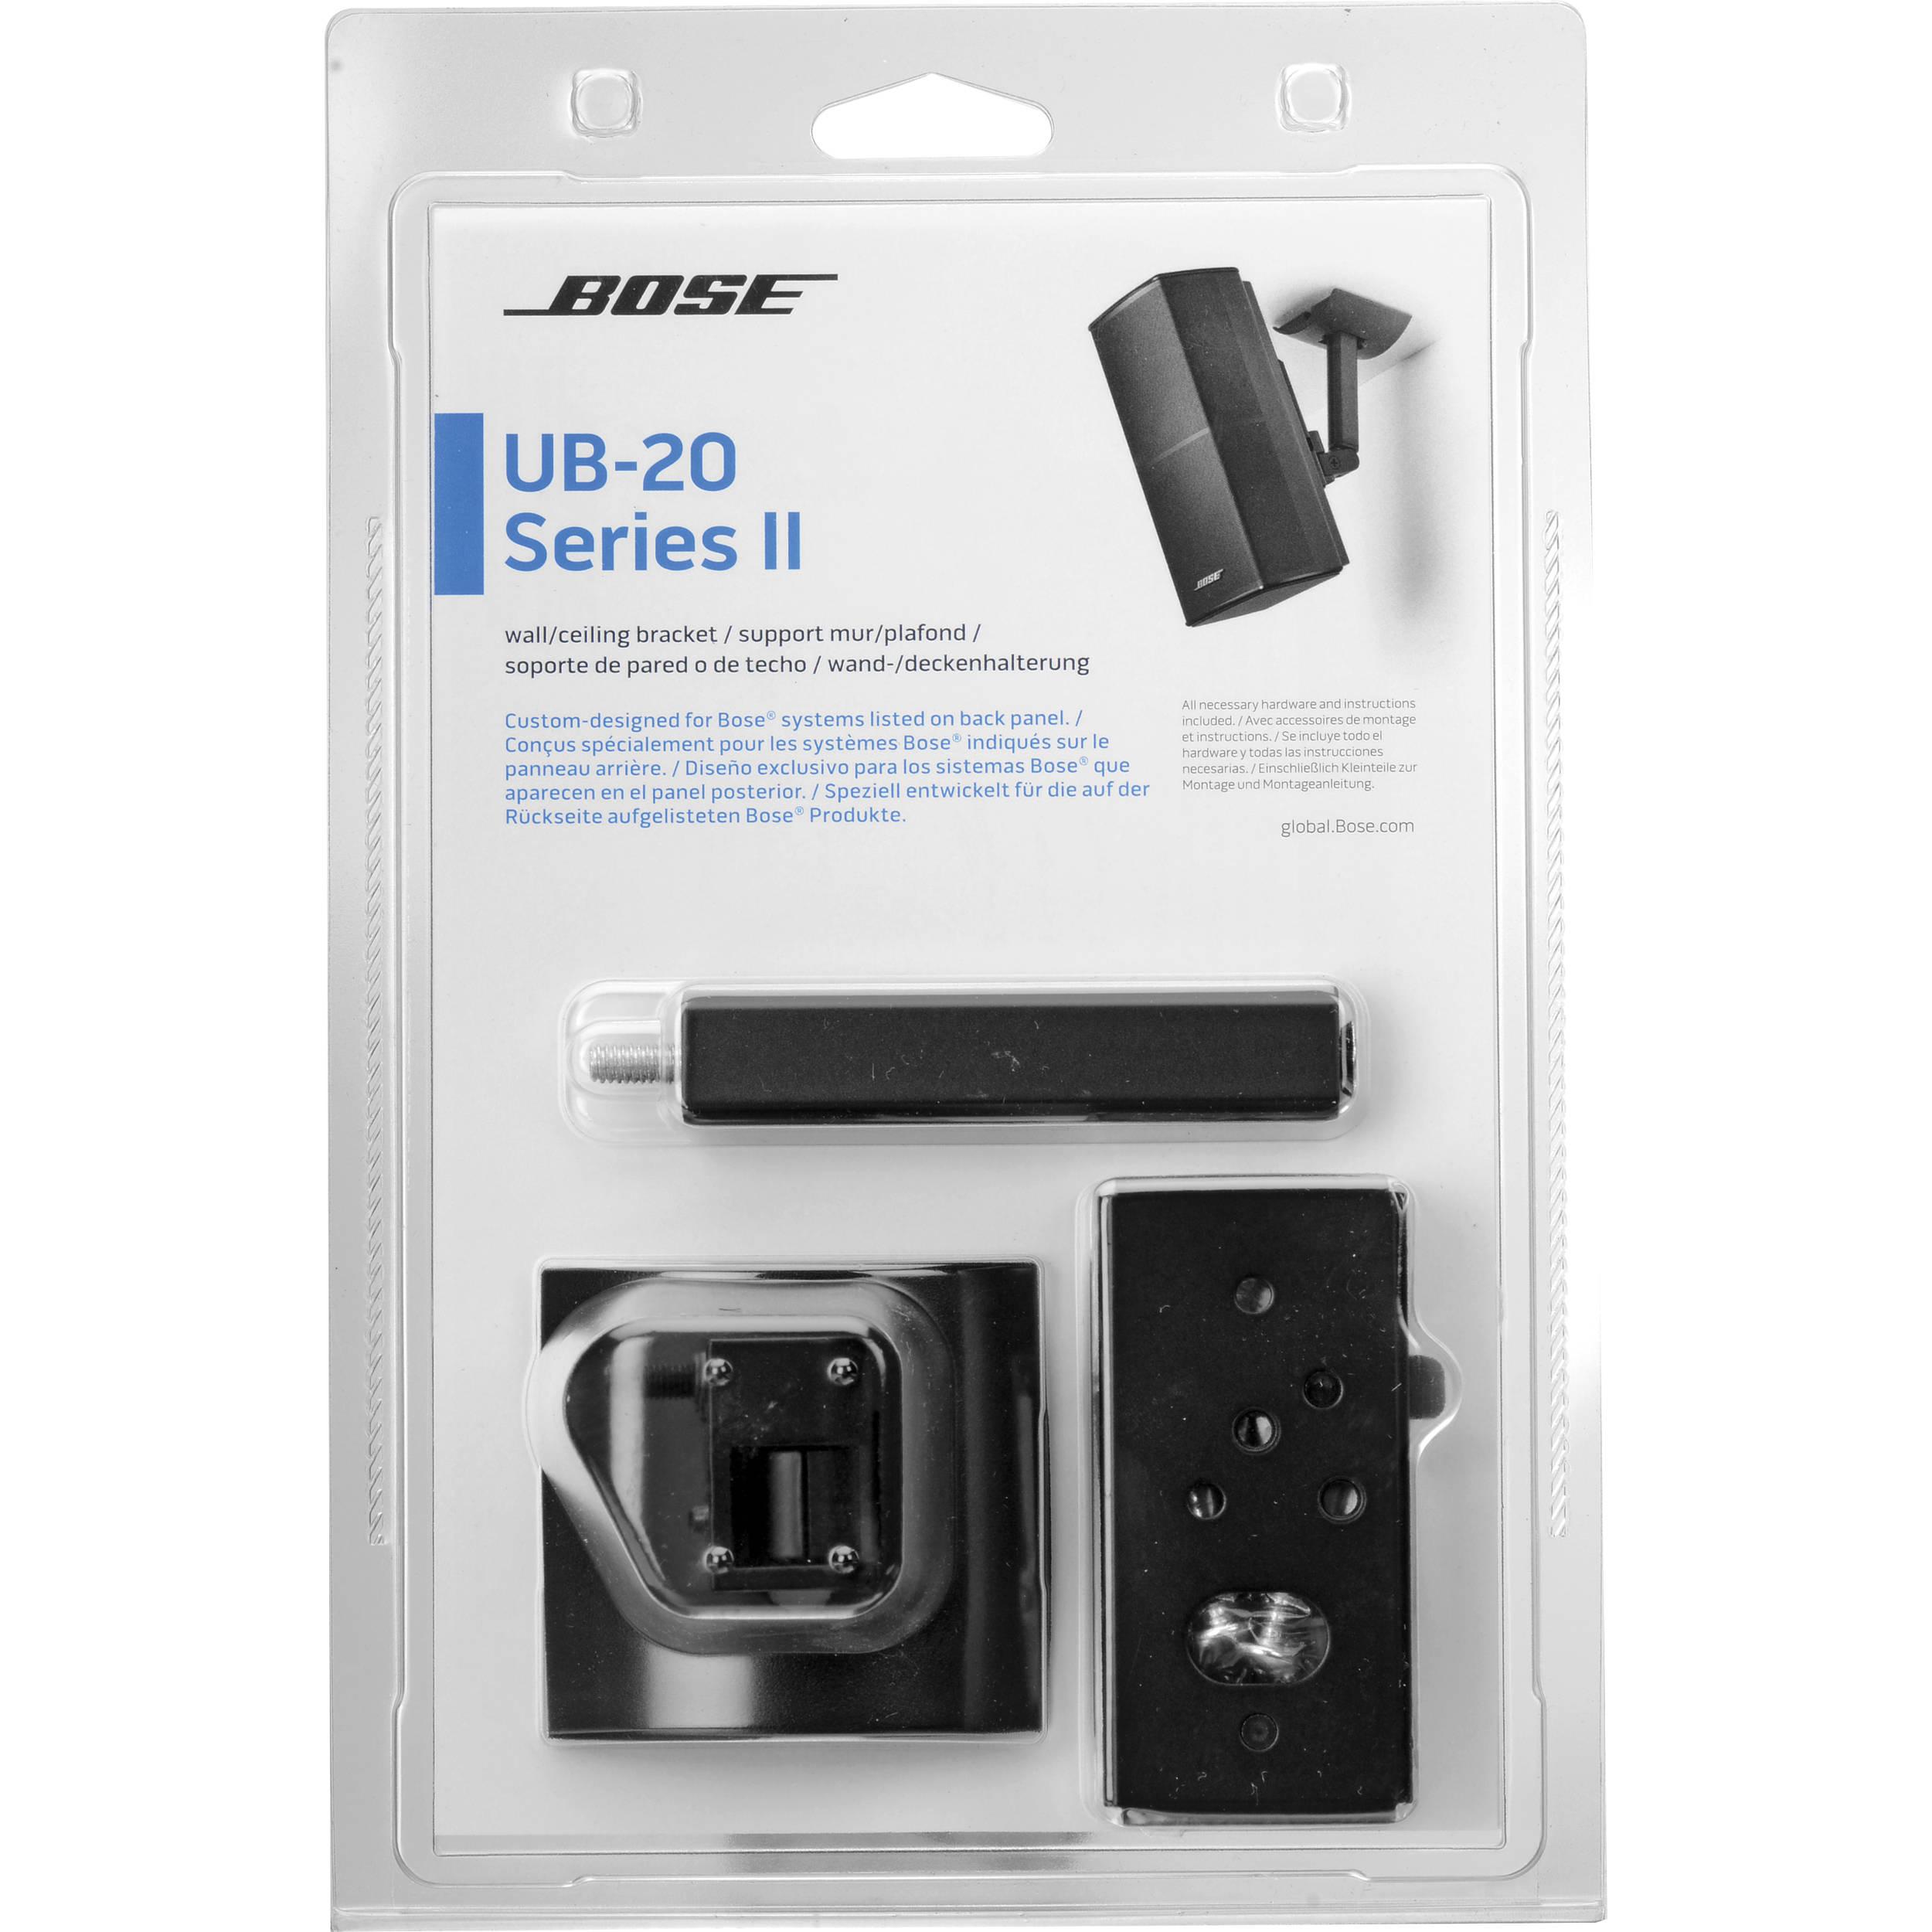 Bose Ub 20 Series Ii Wall Ceiling Bracket Black 722141 0010